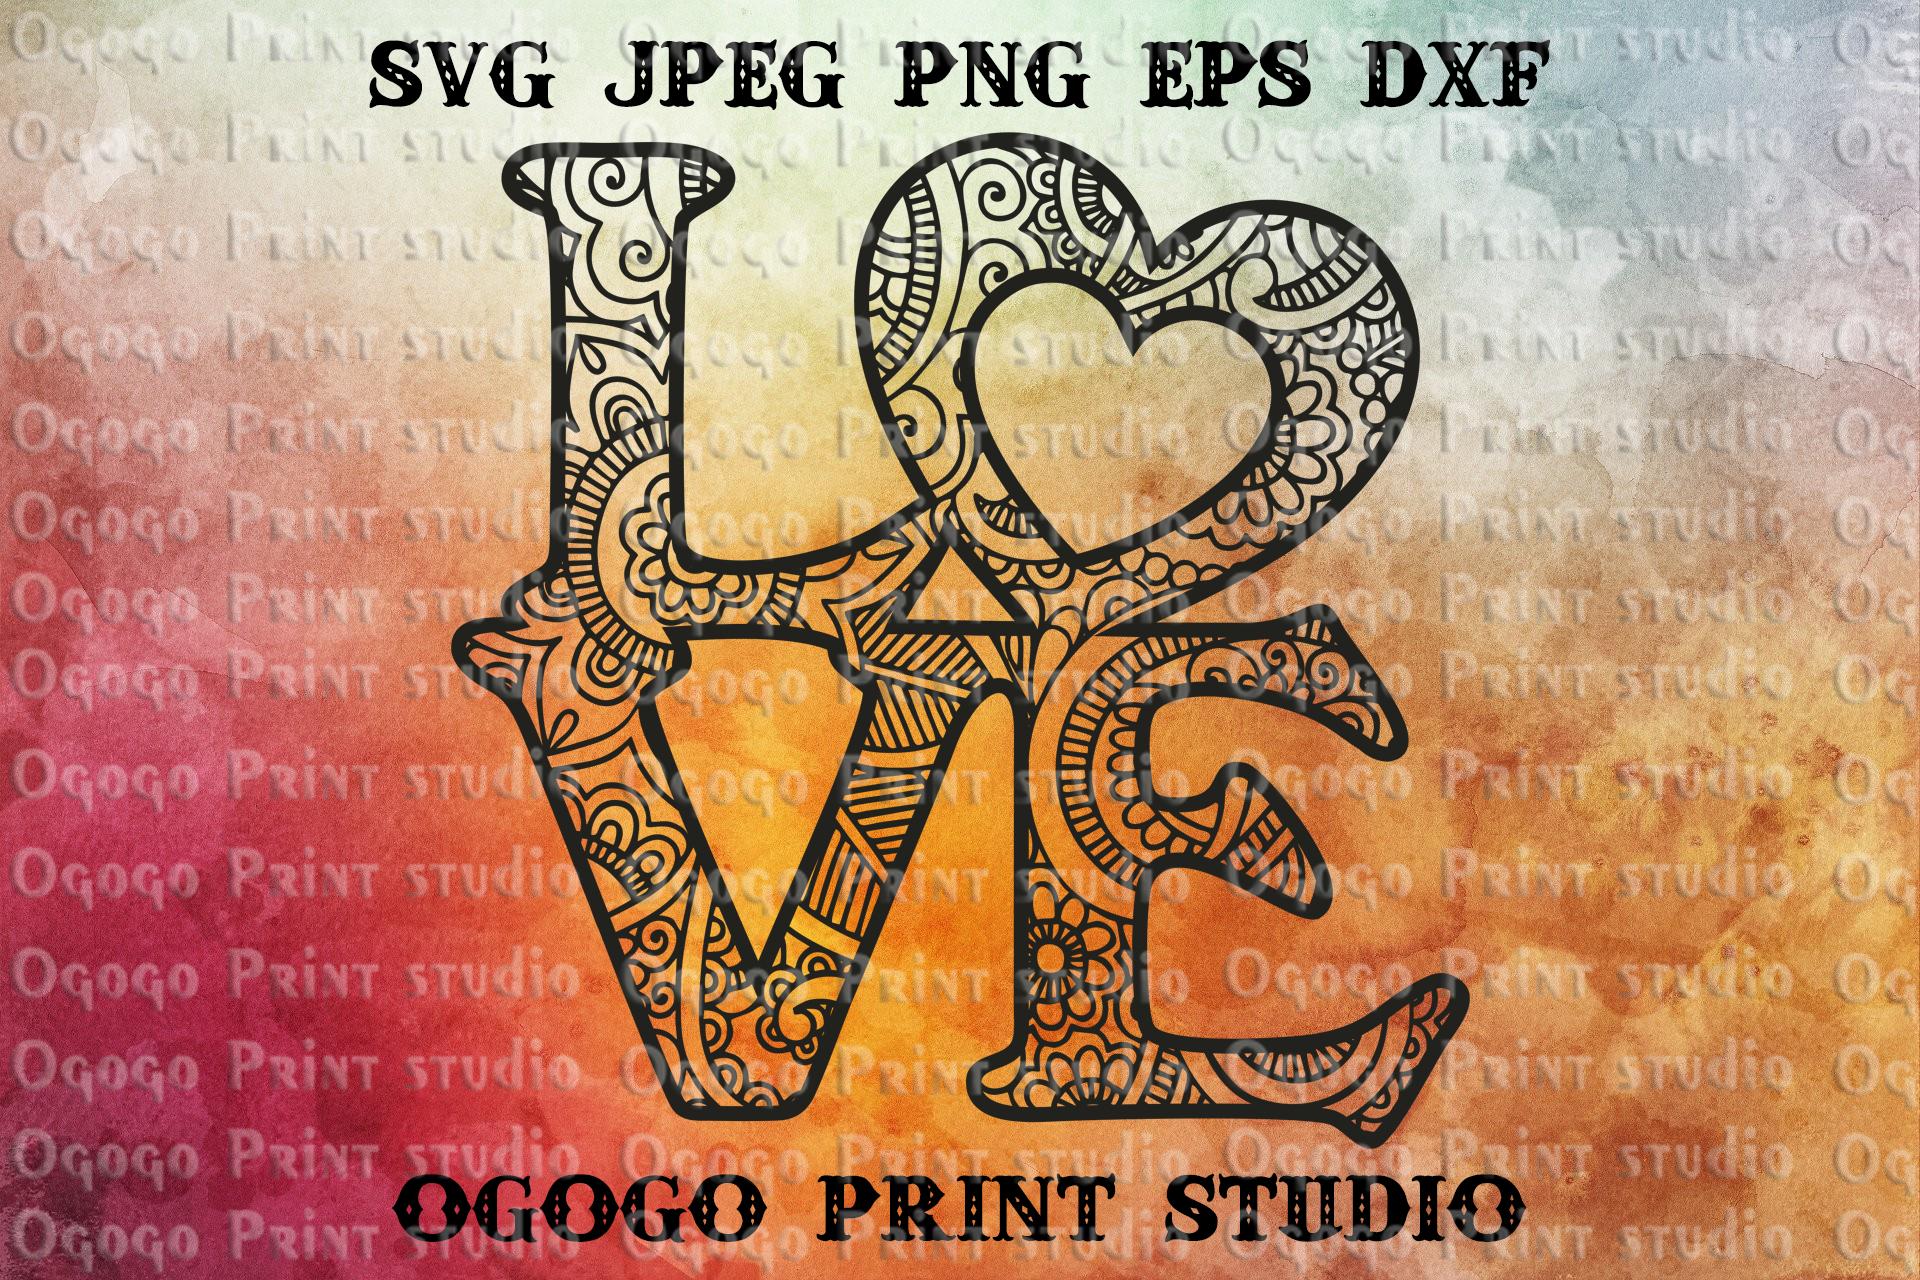 Love svg, Valentines day SVG, Heart SVG, Zentangle SVG example image 1